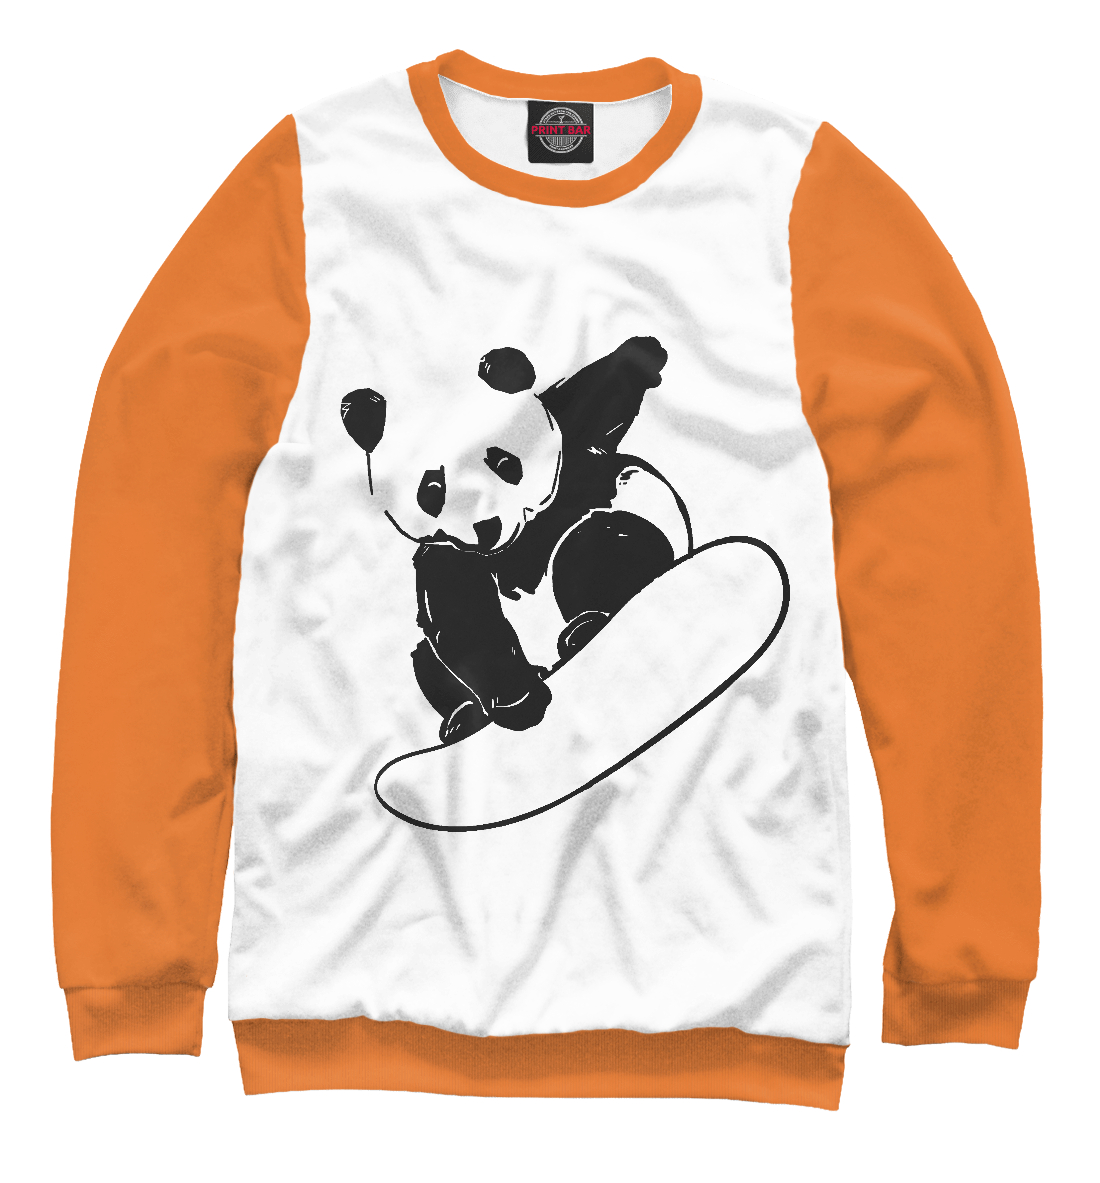 Купить Panda Snowboarder, Printbar, Свитшоты, SNW-693713-swi-2